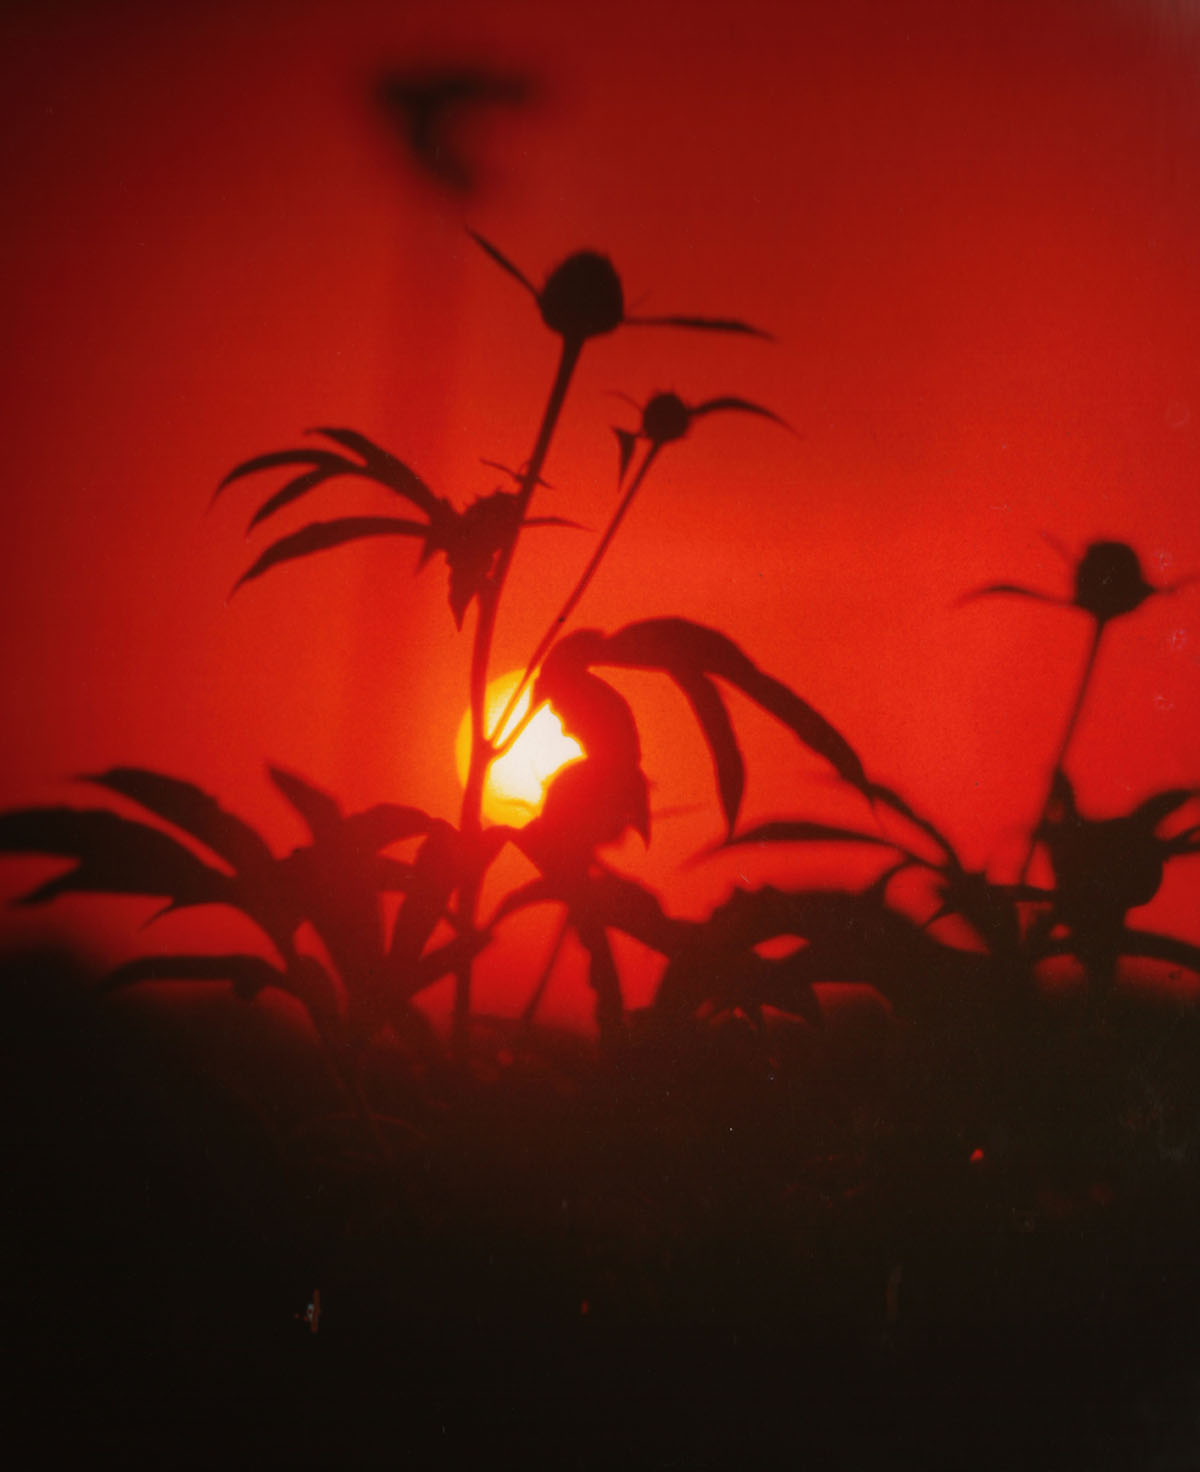 peonies at sundown 2